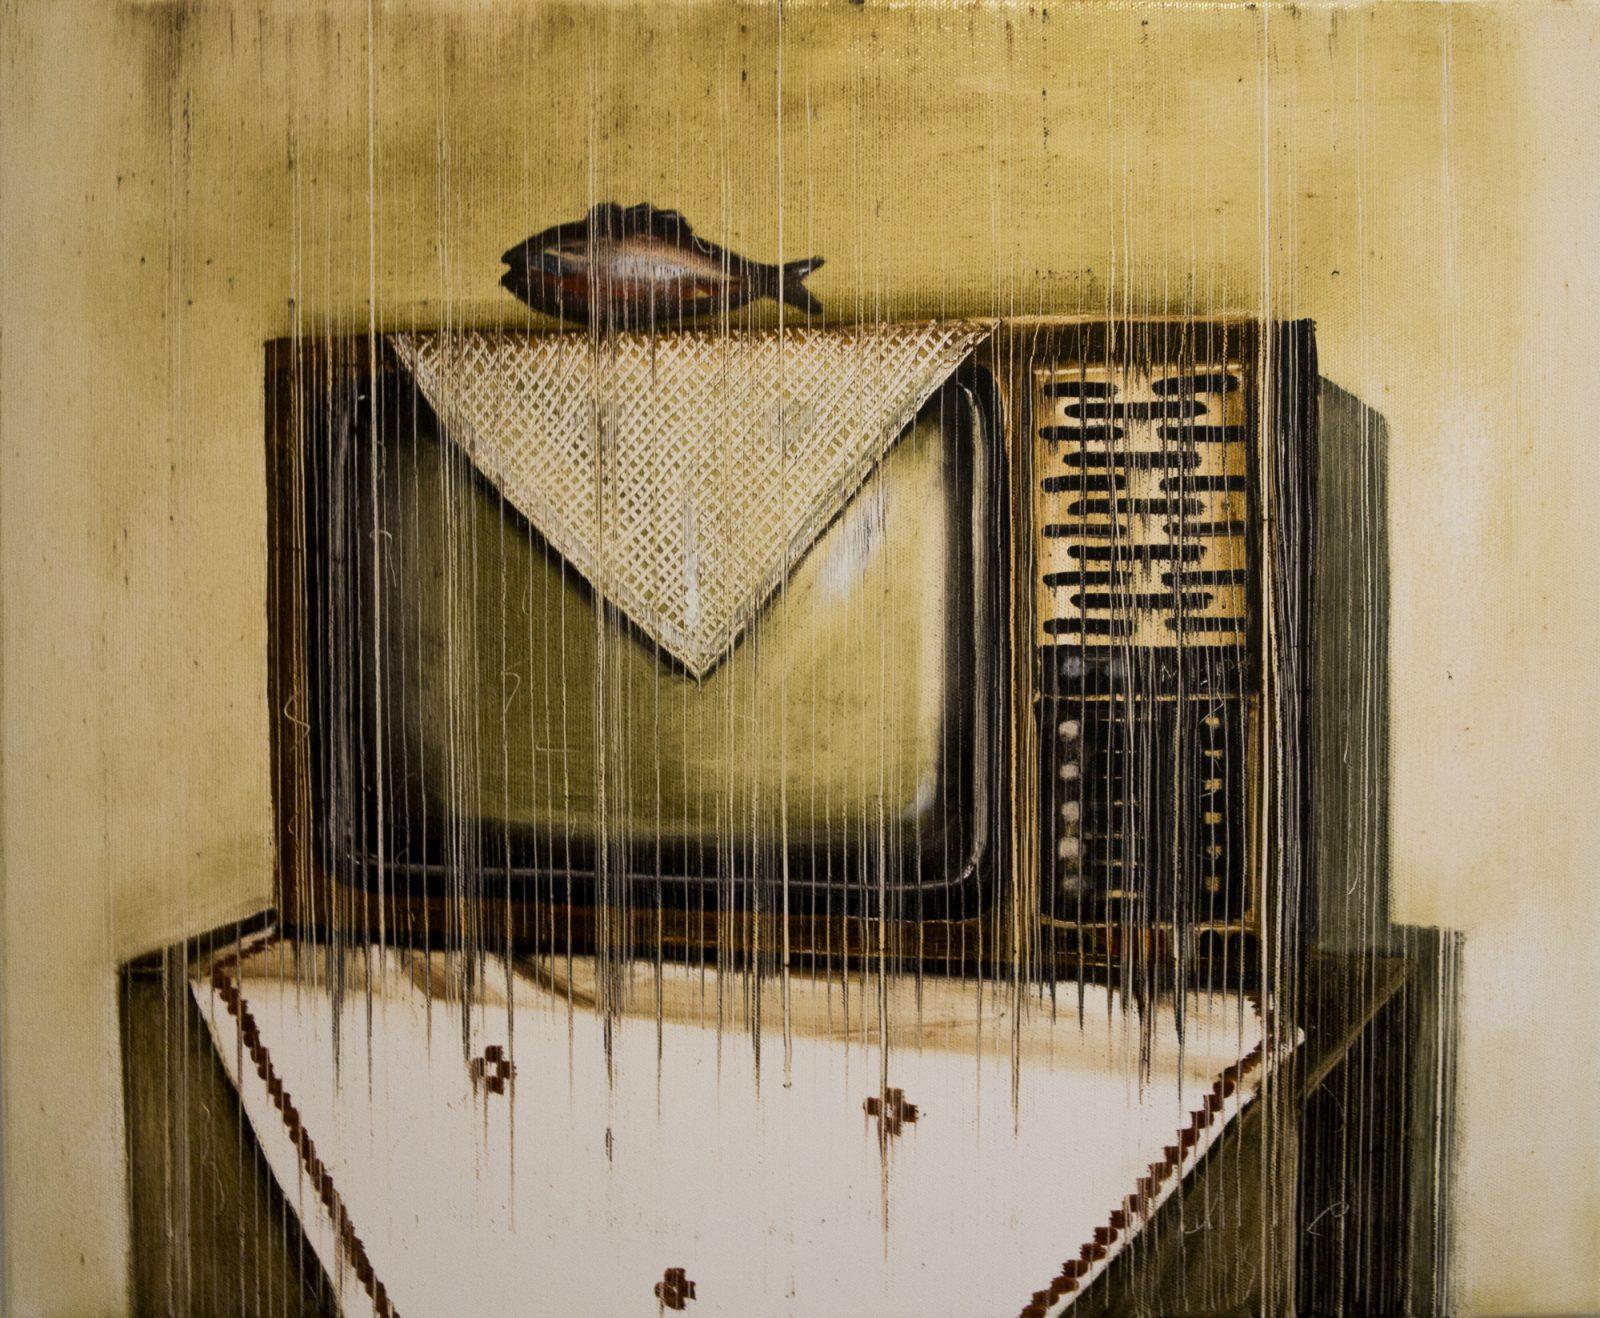 Herman Levente: Television